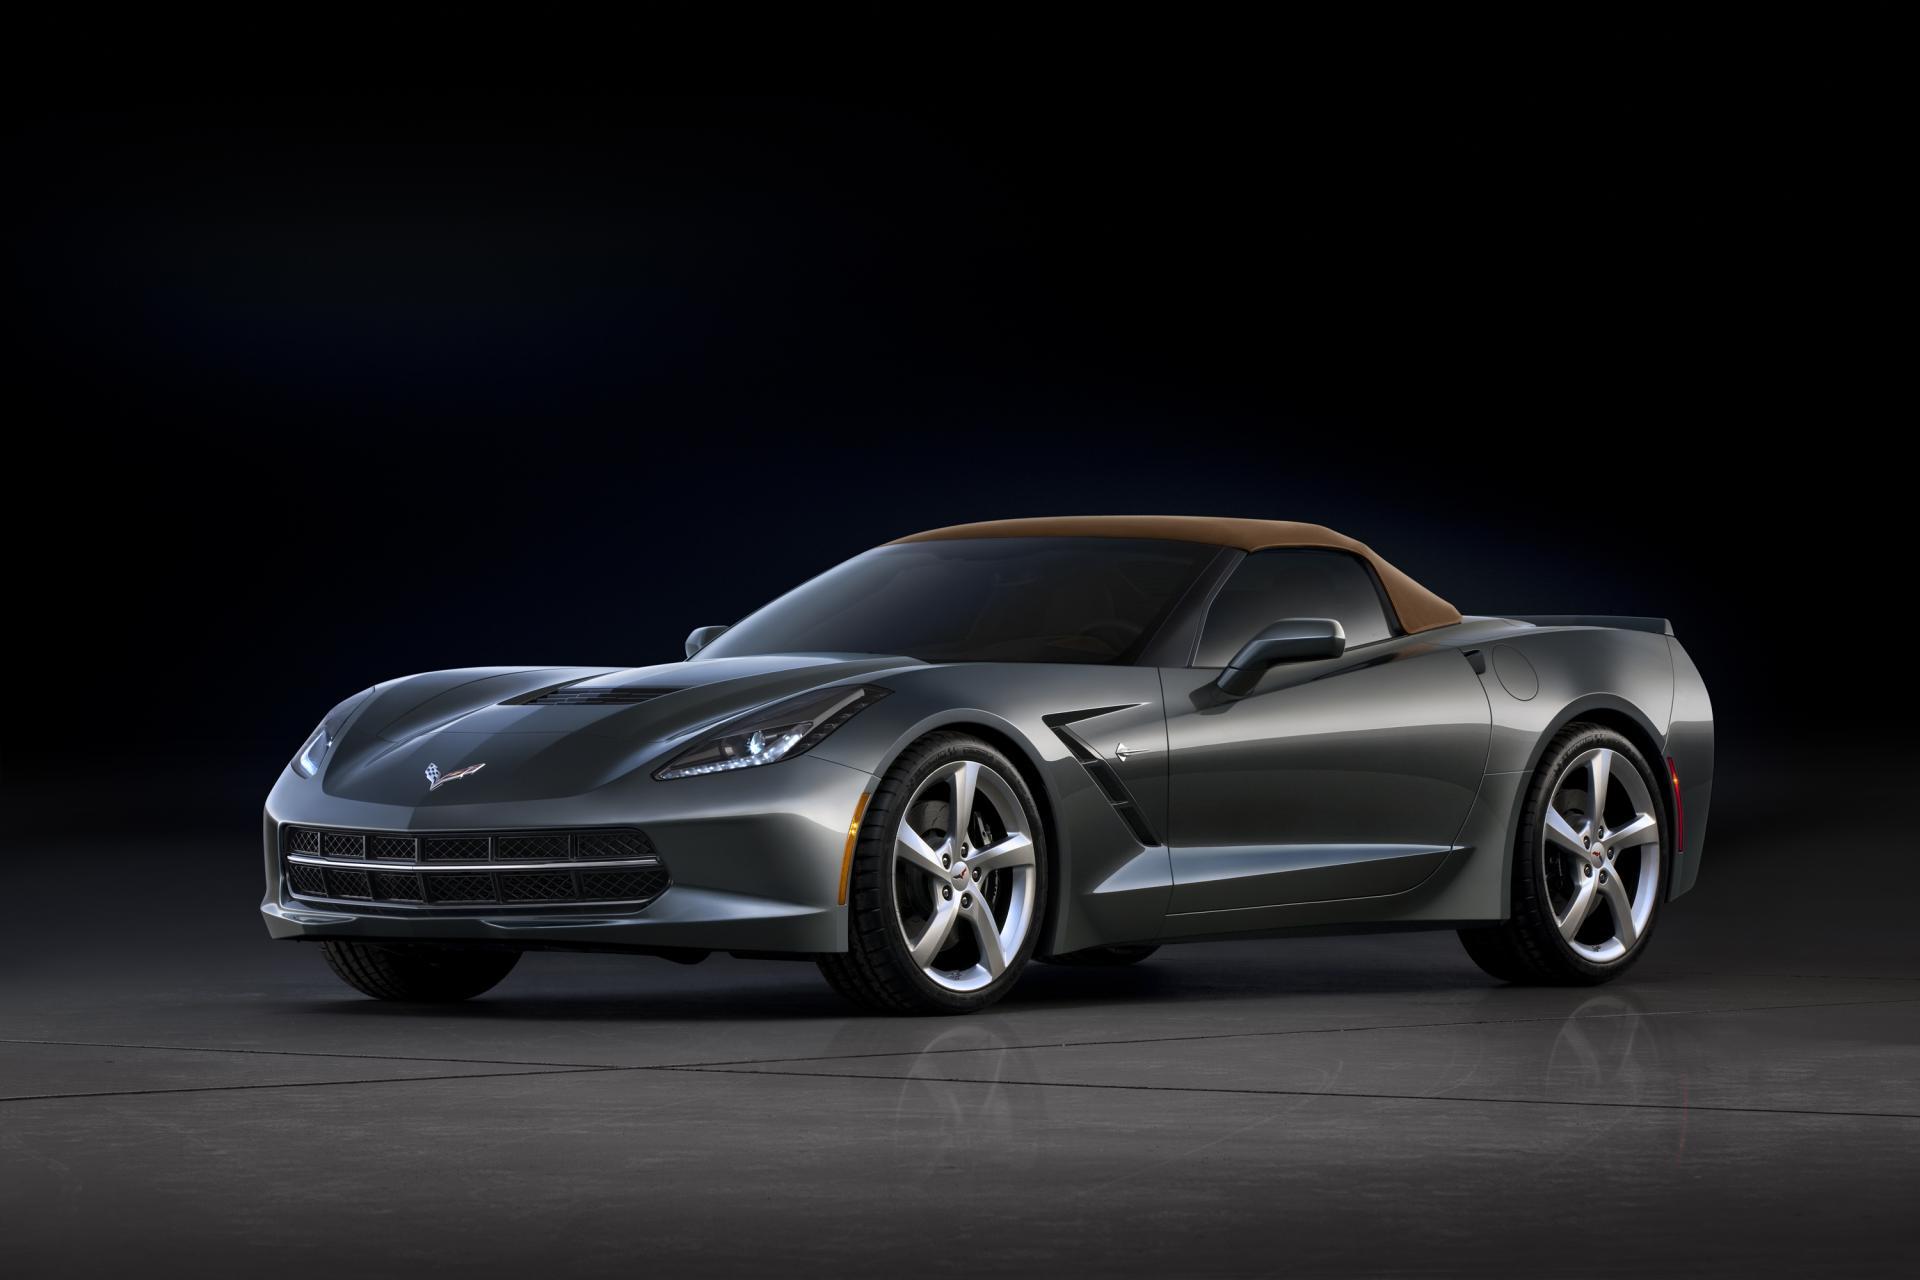 2014 Chevrolet Corvette Stingray Convertible News and Information